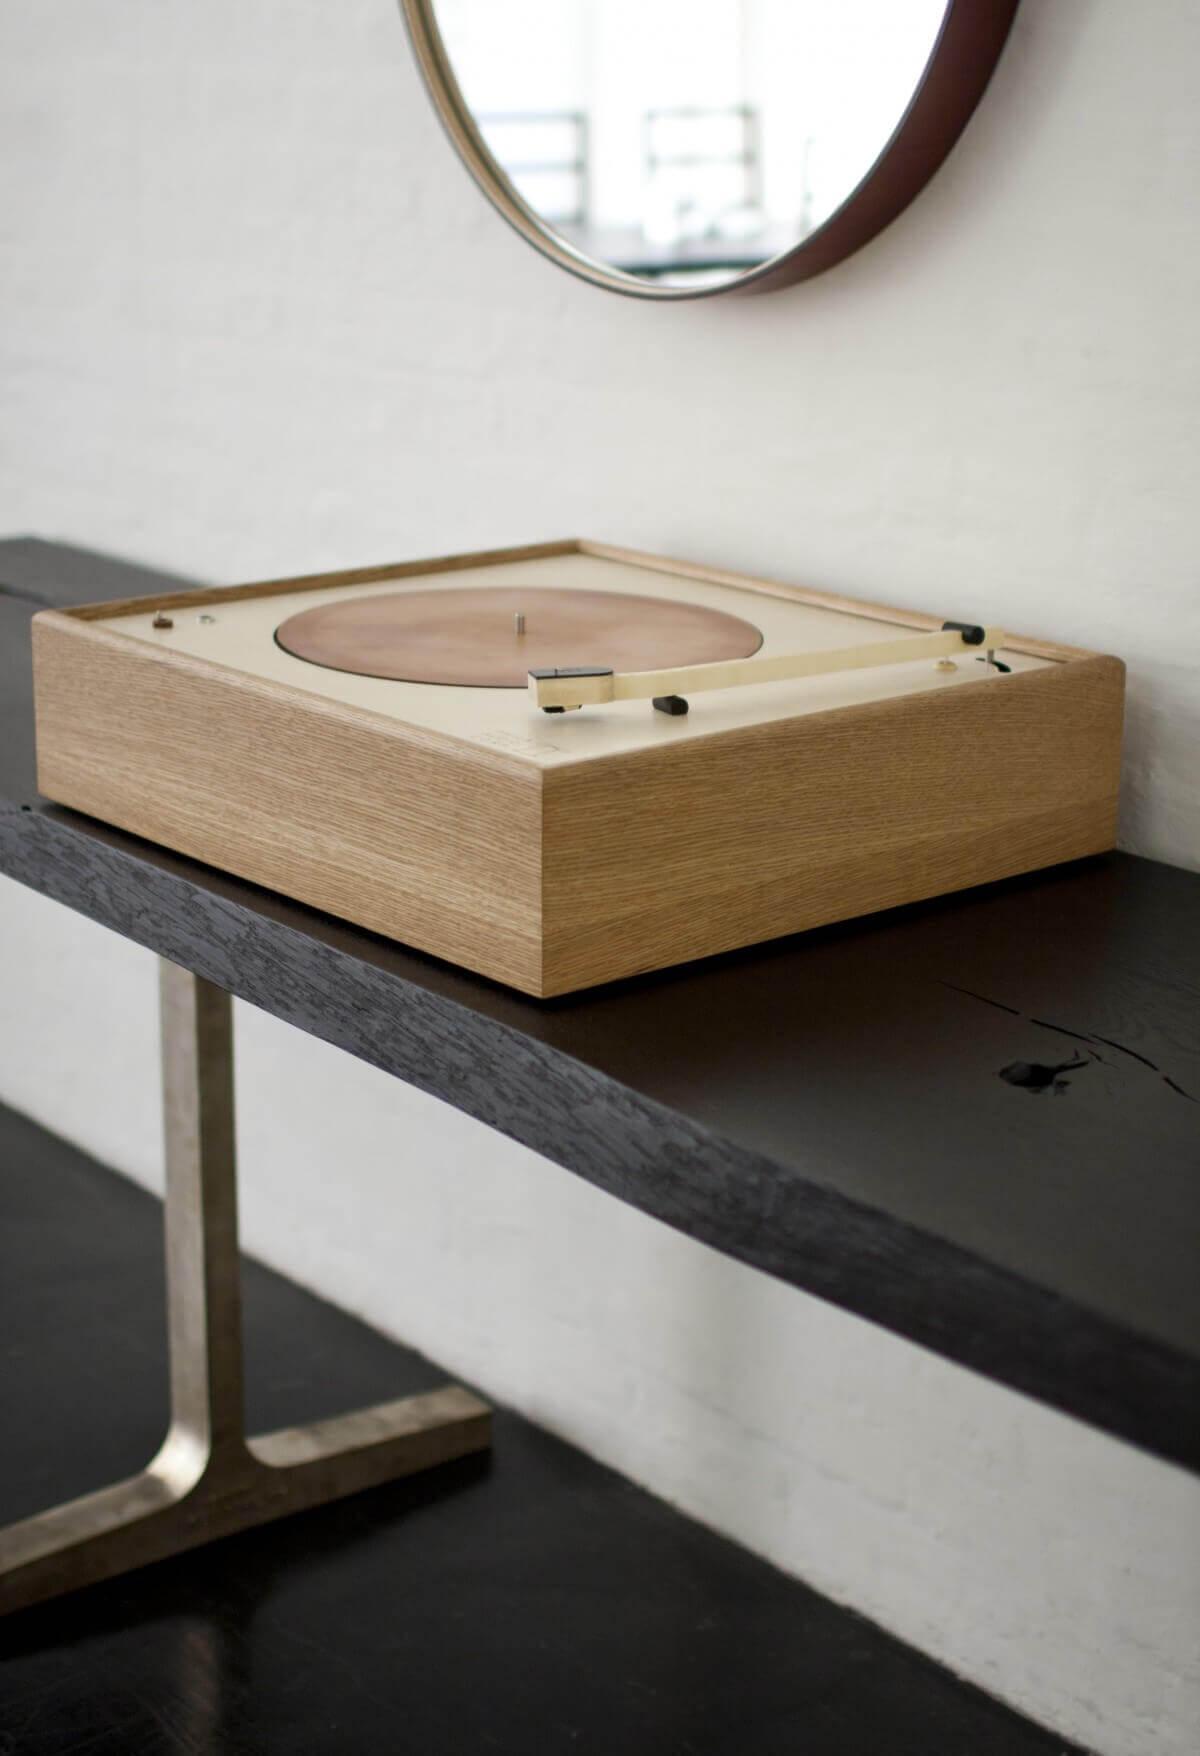 BDDW wooden turntable